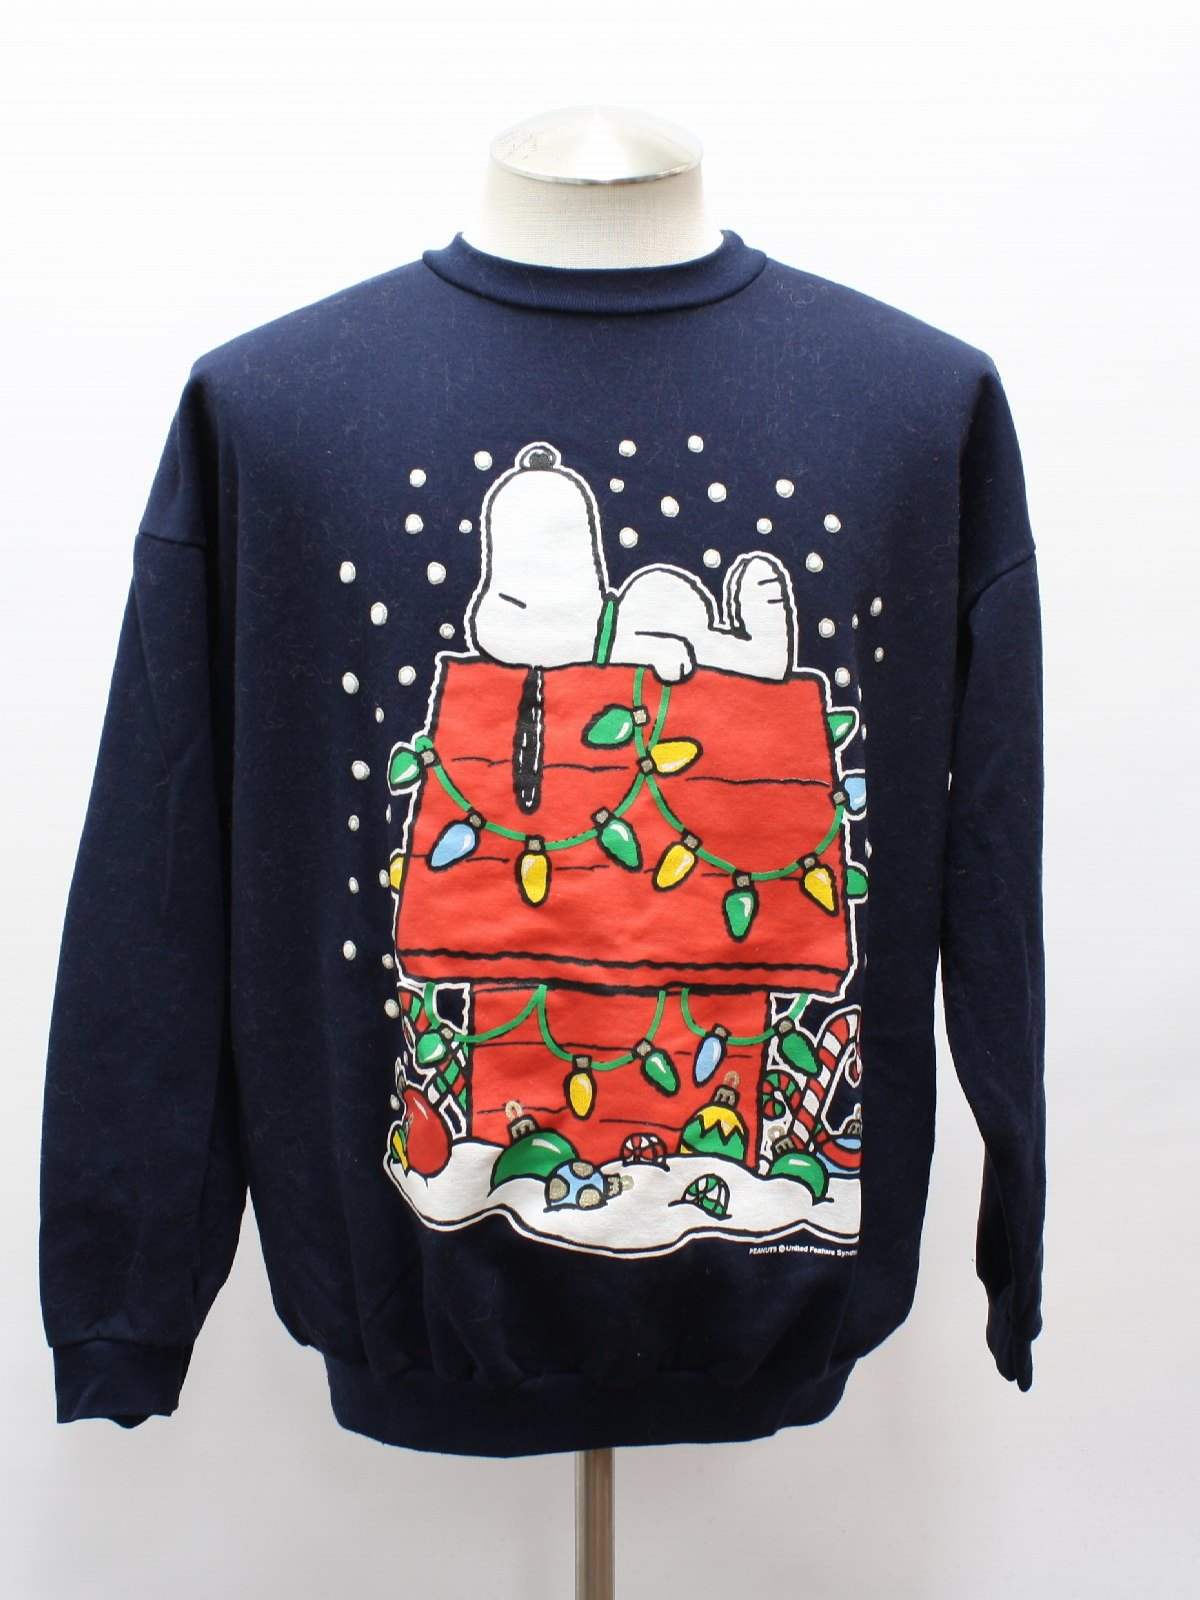 Eighties Vintage Snoopy Ugly Christmas Sweatshirt 80s